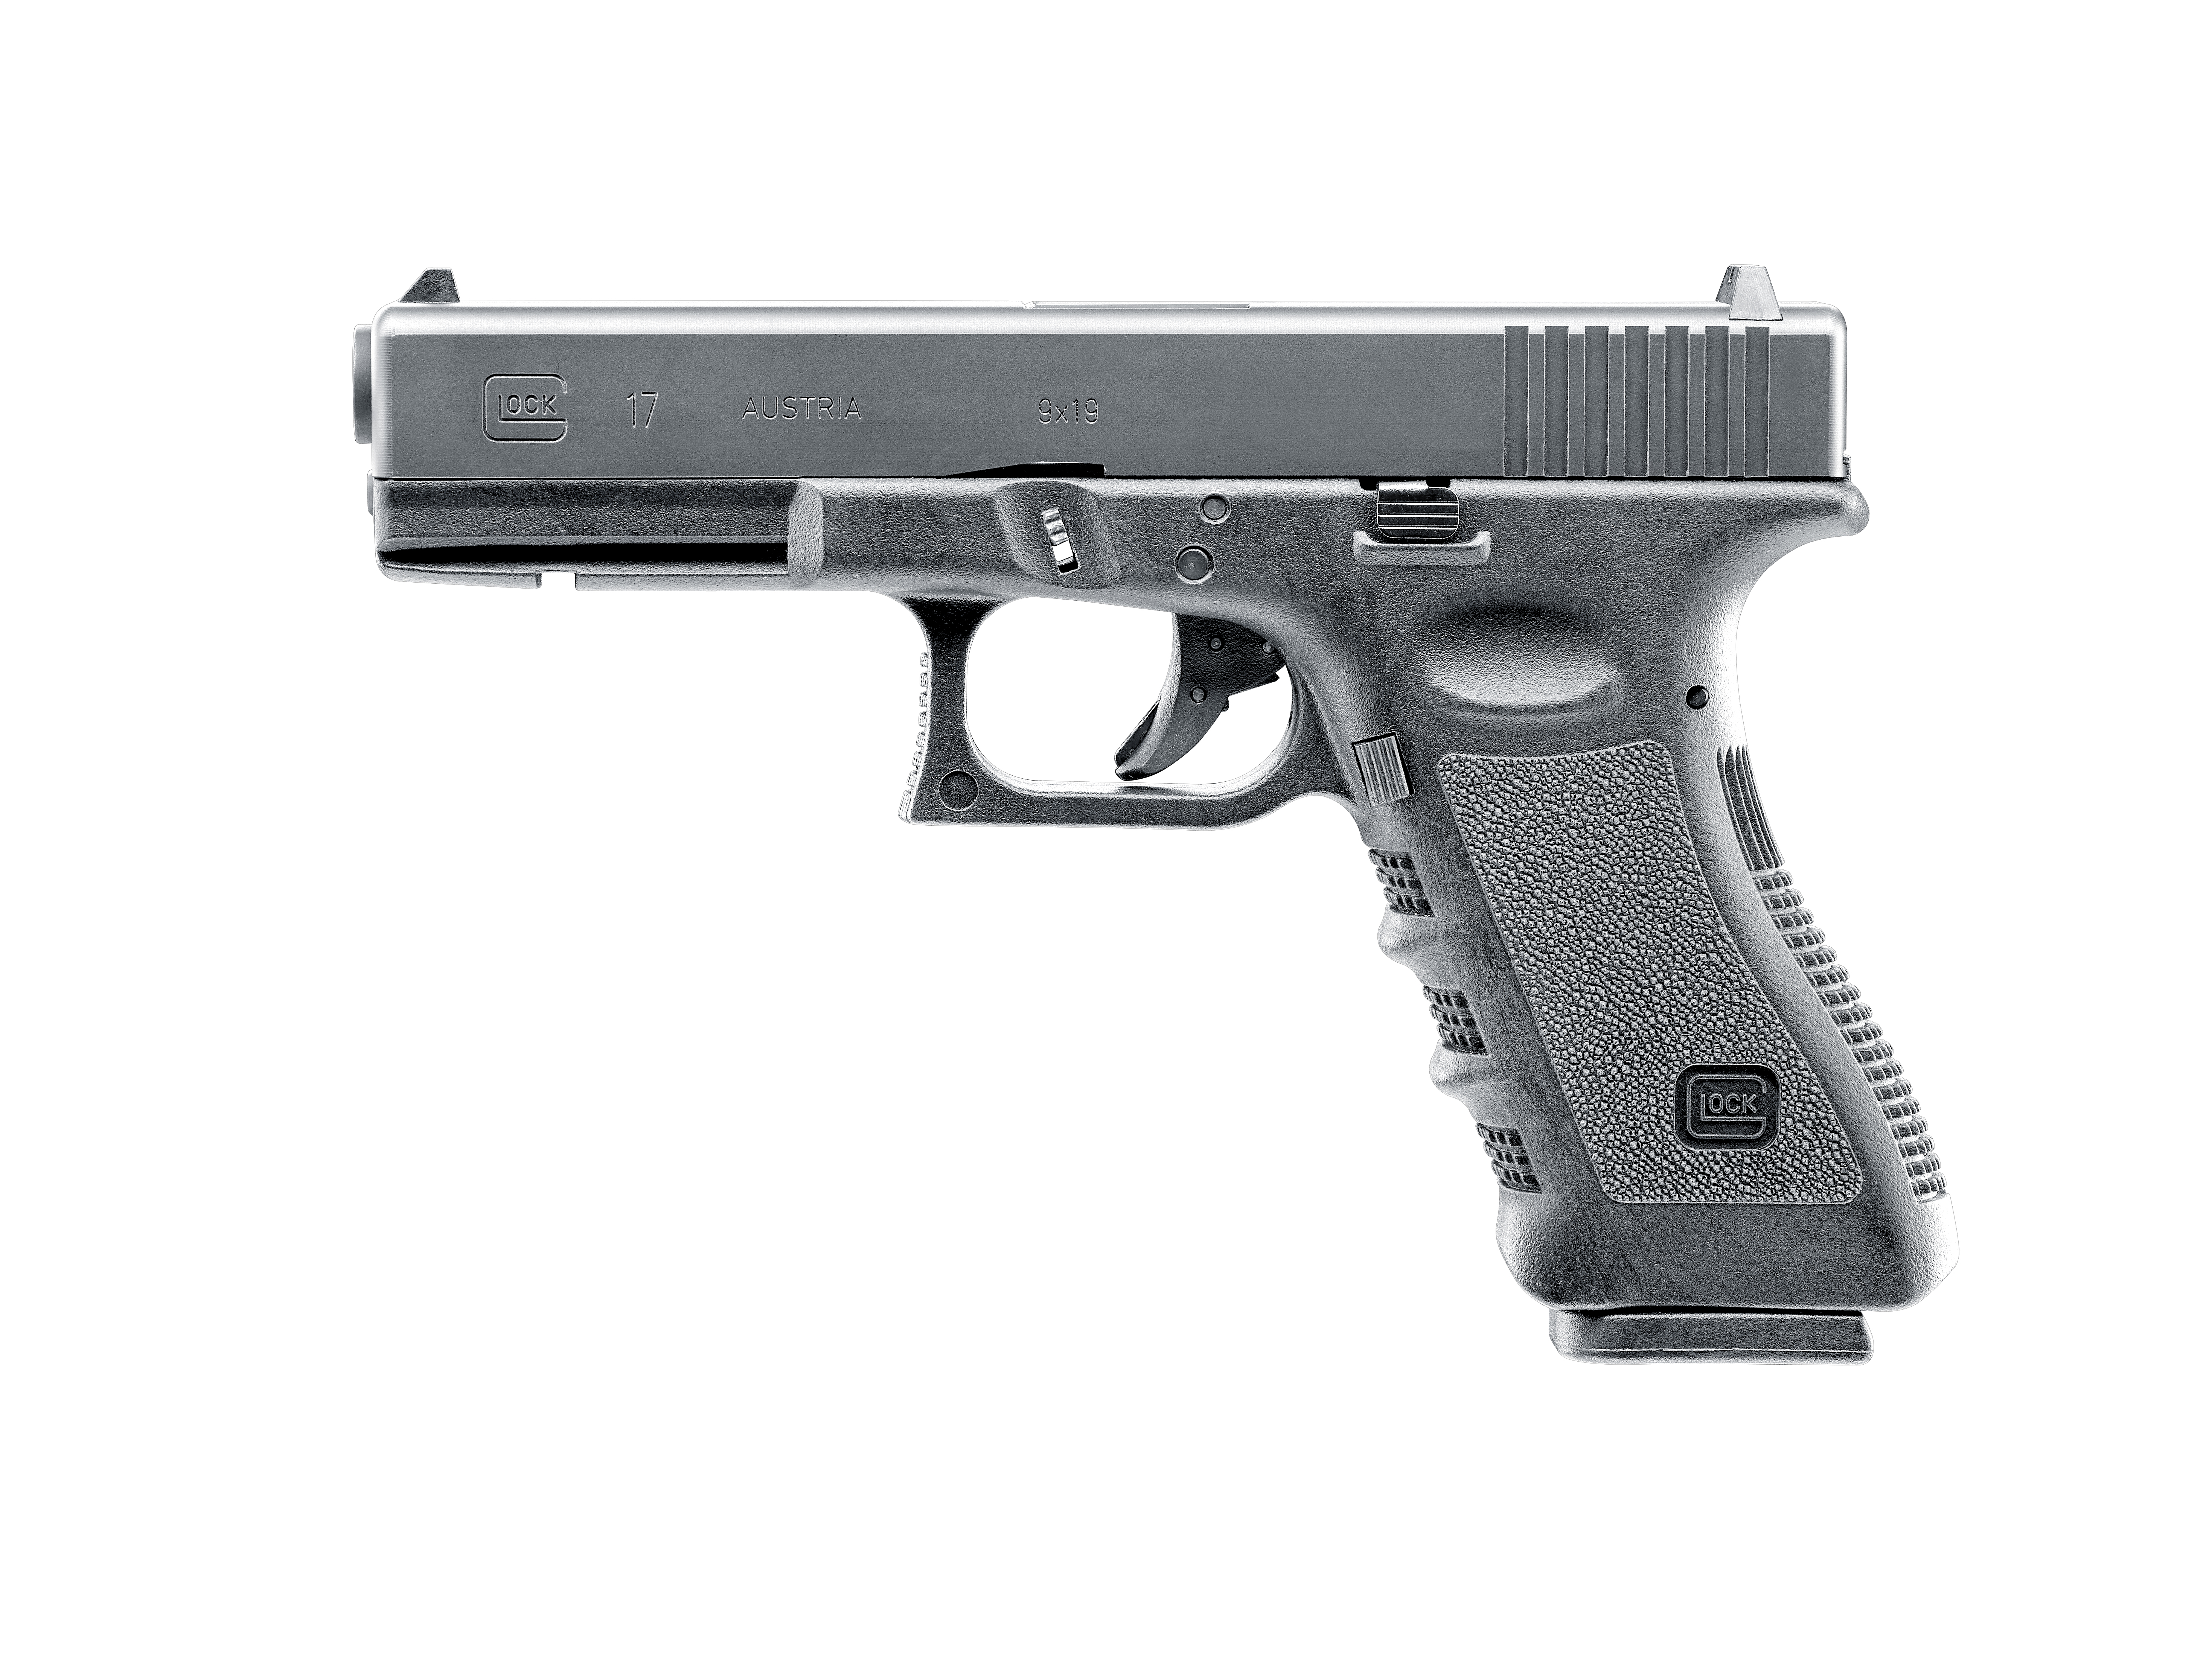 GLOCK (Umarex) Airsoft GBB Glock 17 Ultimate